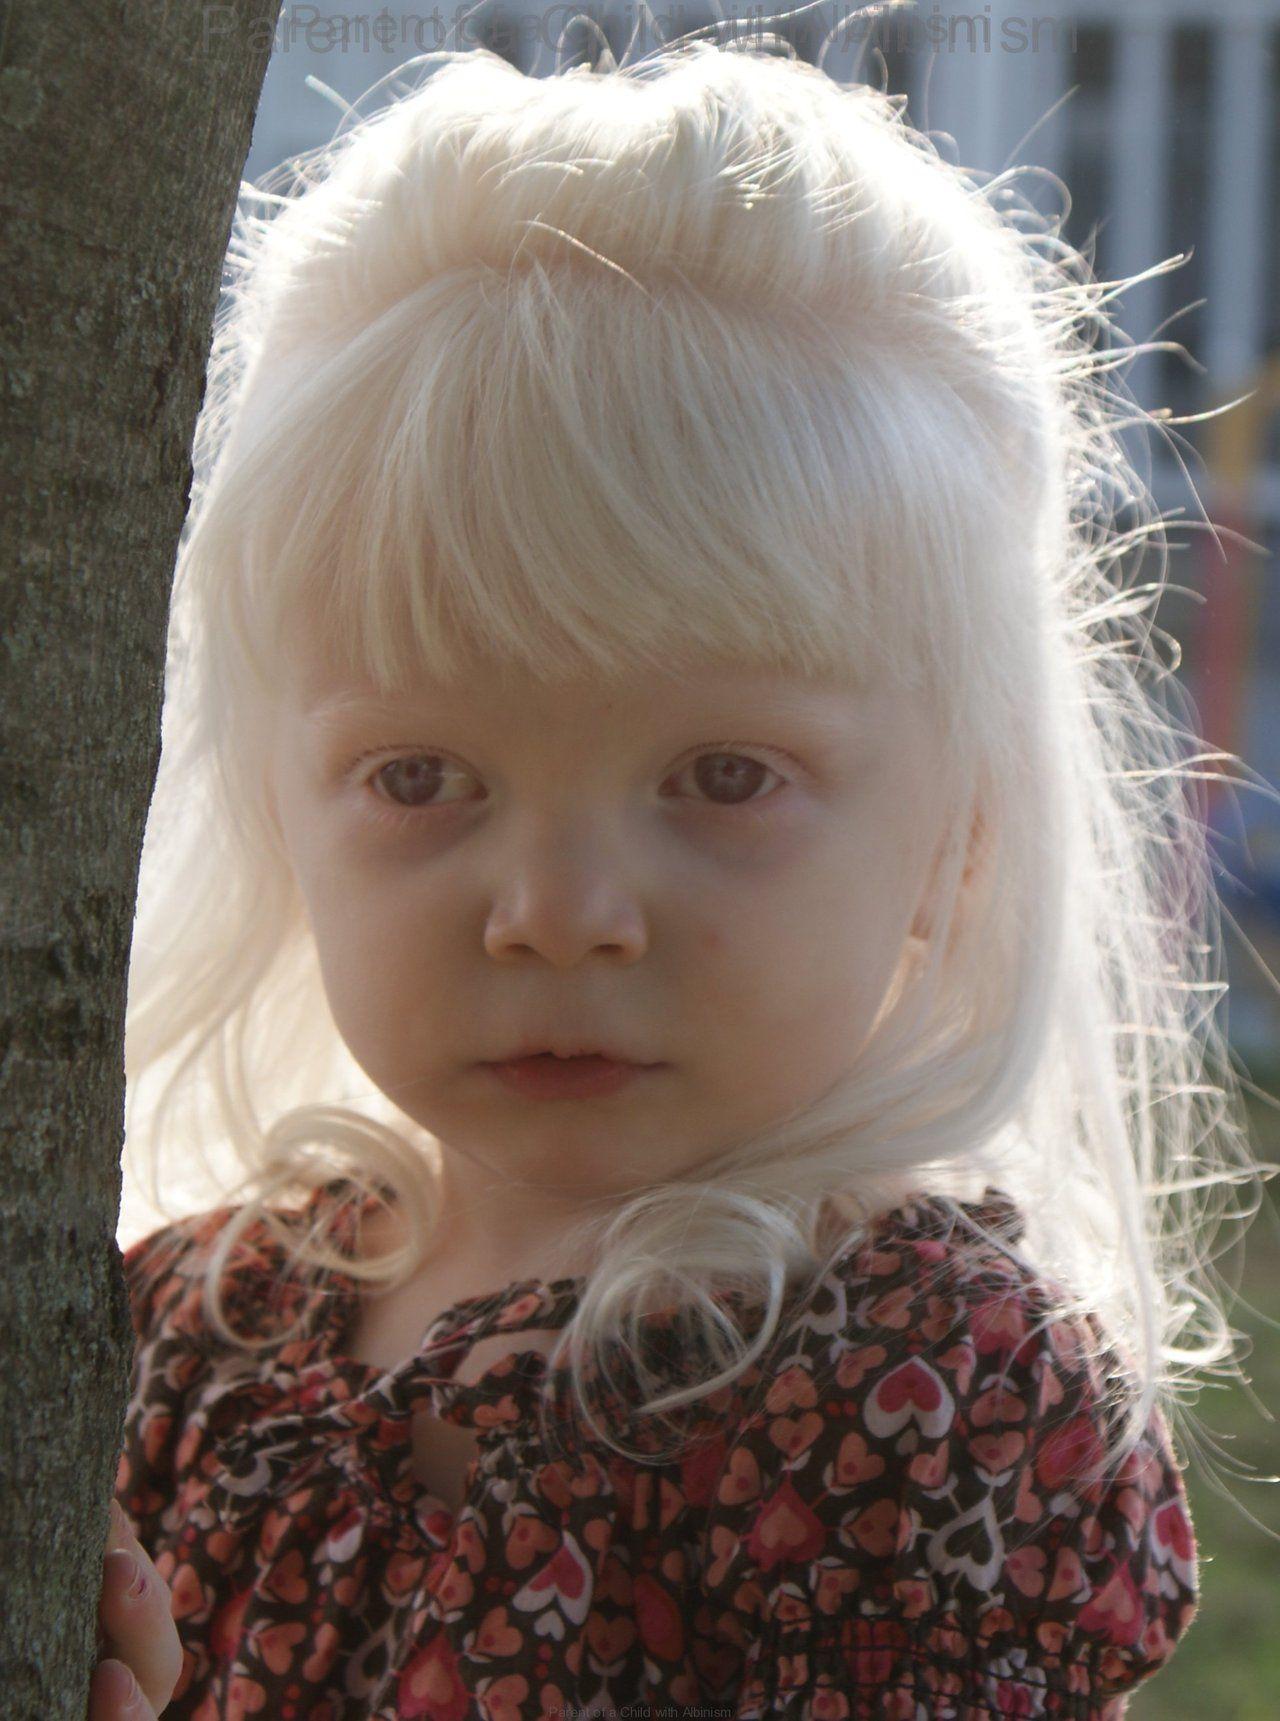 Pin By Miriam Noordpool On Albino Beauty Albinism Albino Human Albino